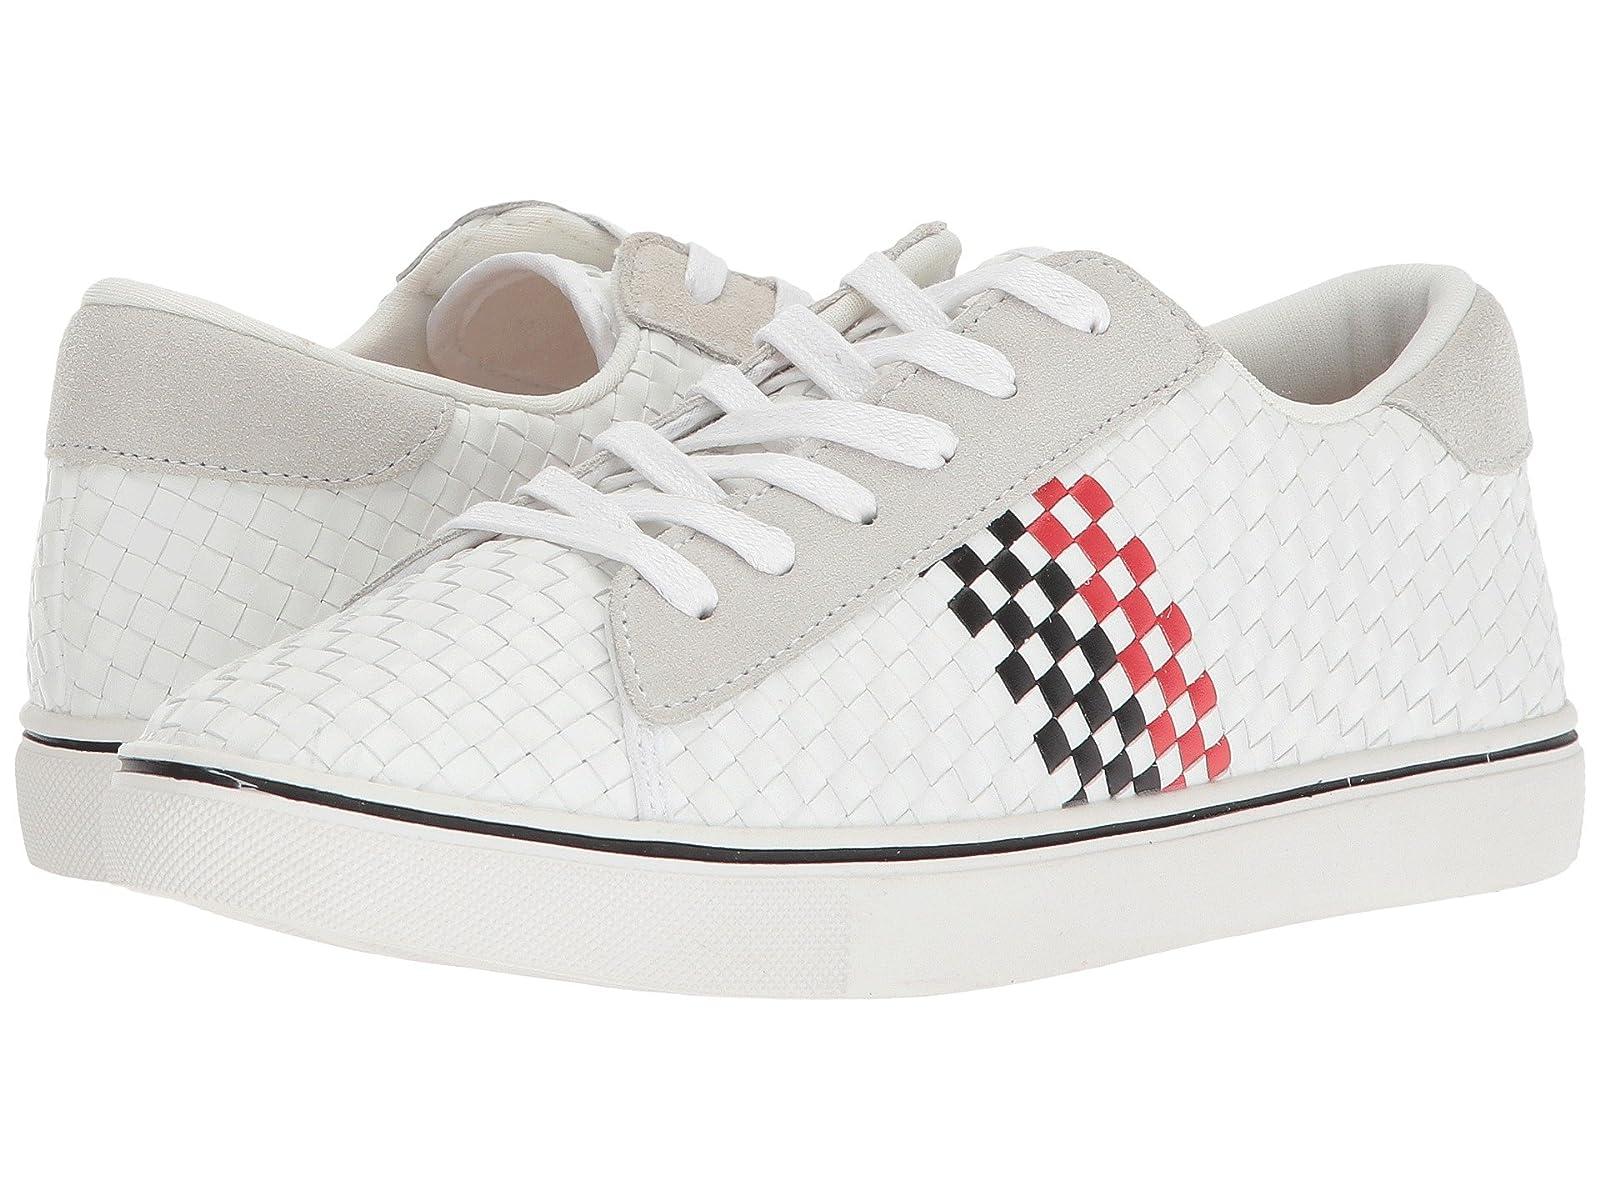 bernie mev. EssexAtmospheric grades have affordable shoes